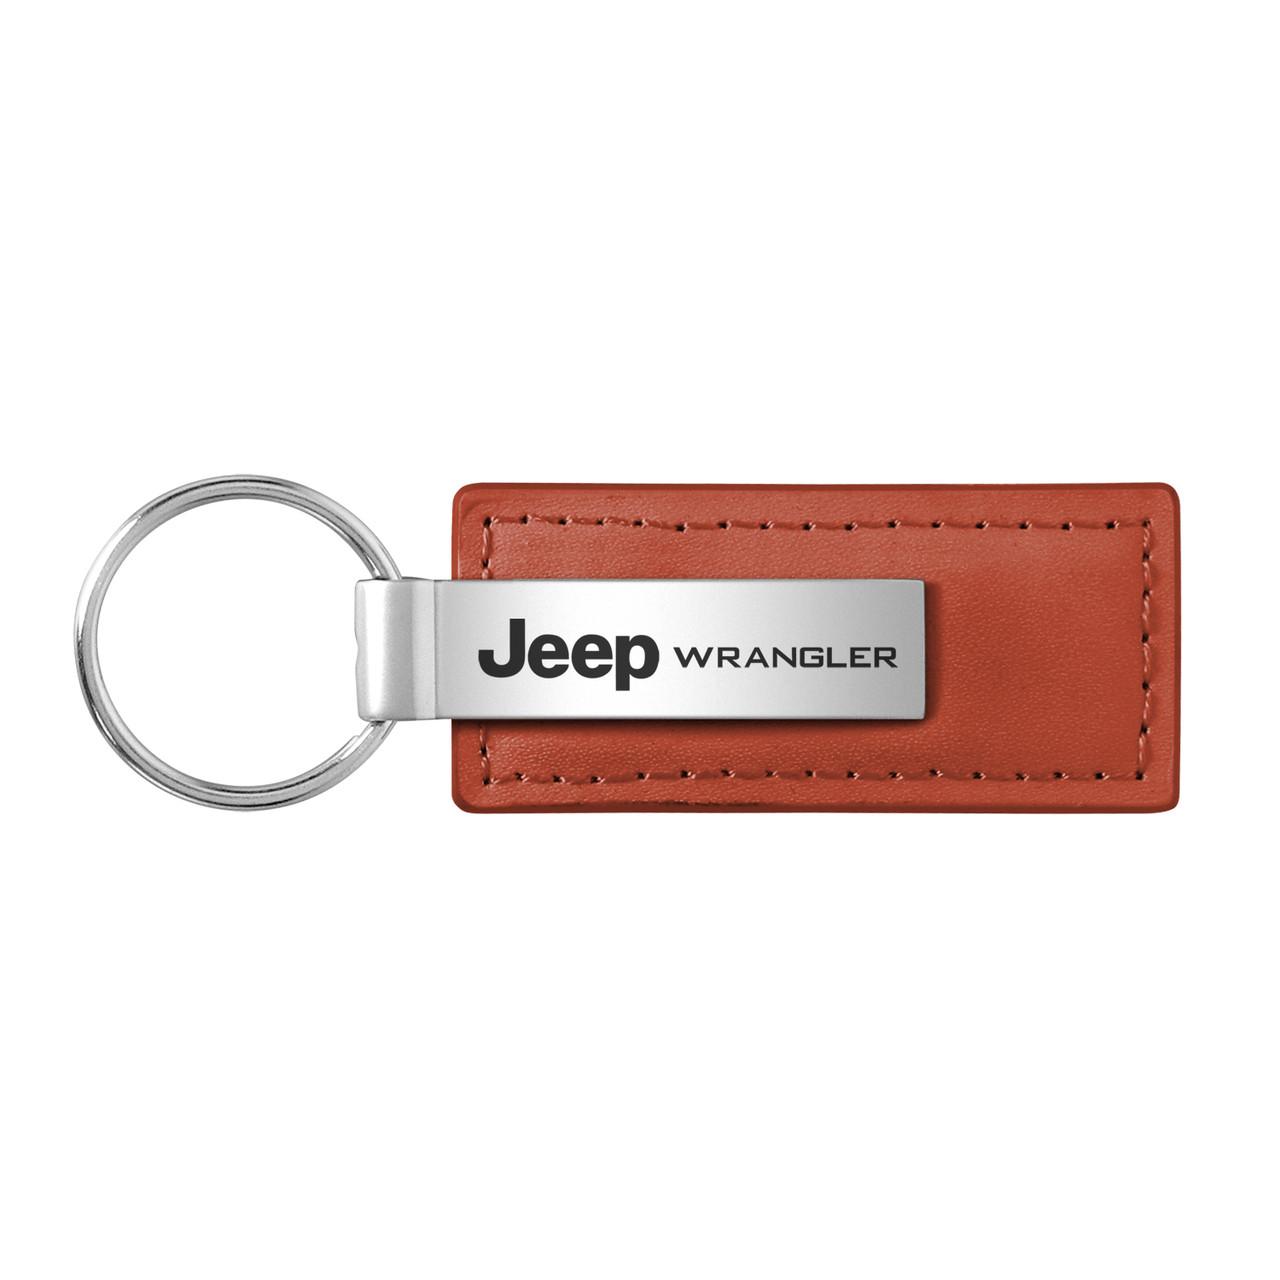 Jeep Rubicon Wrangler Black 100/% Real Carbon Fiber Large Tear-Drop Key Chain